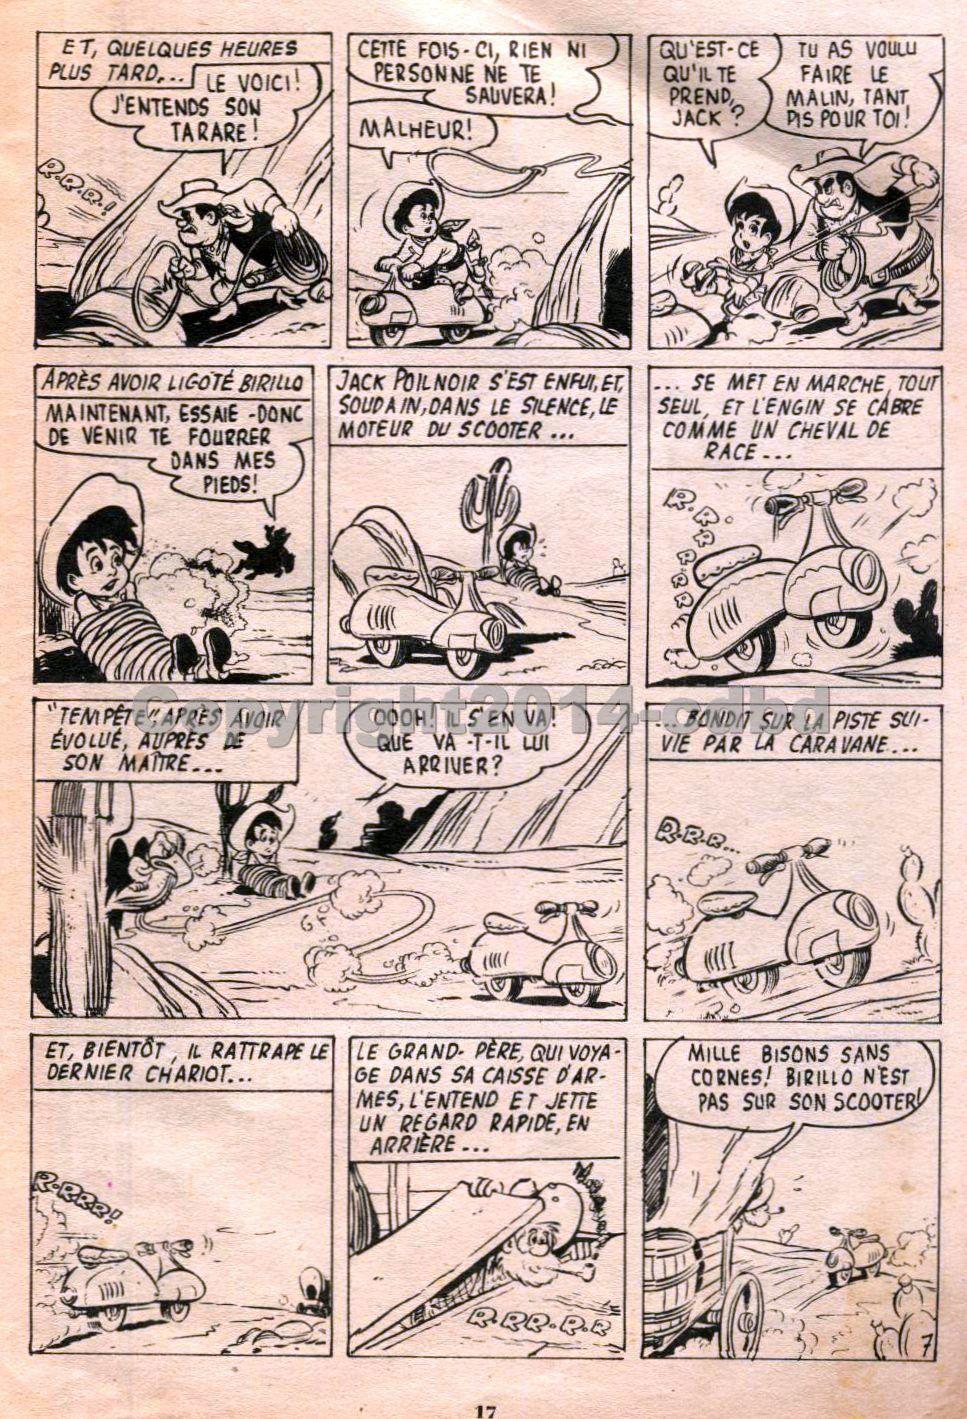 Bimbo trimestriel n°8  d'Octobre 1957- Pages 10 à 19